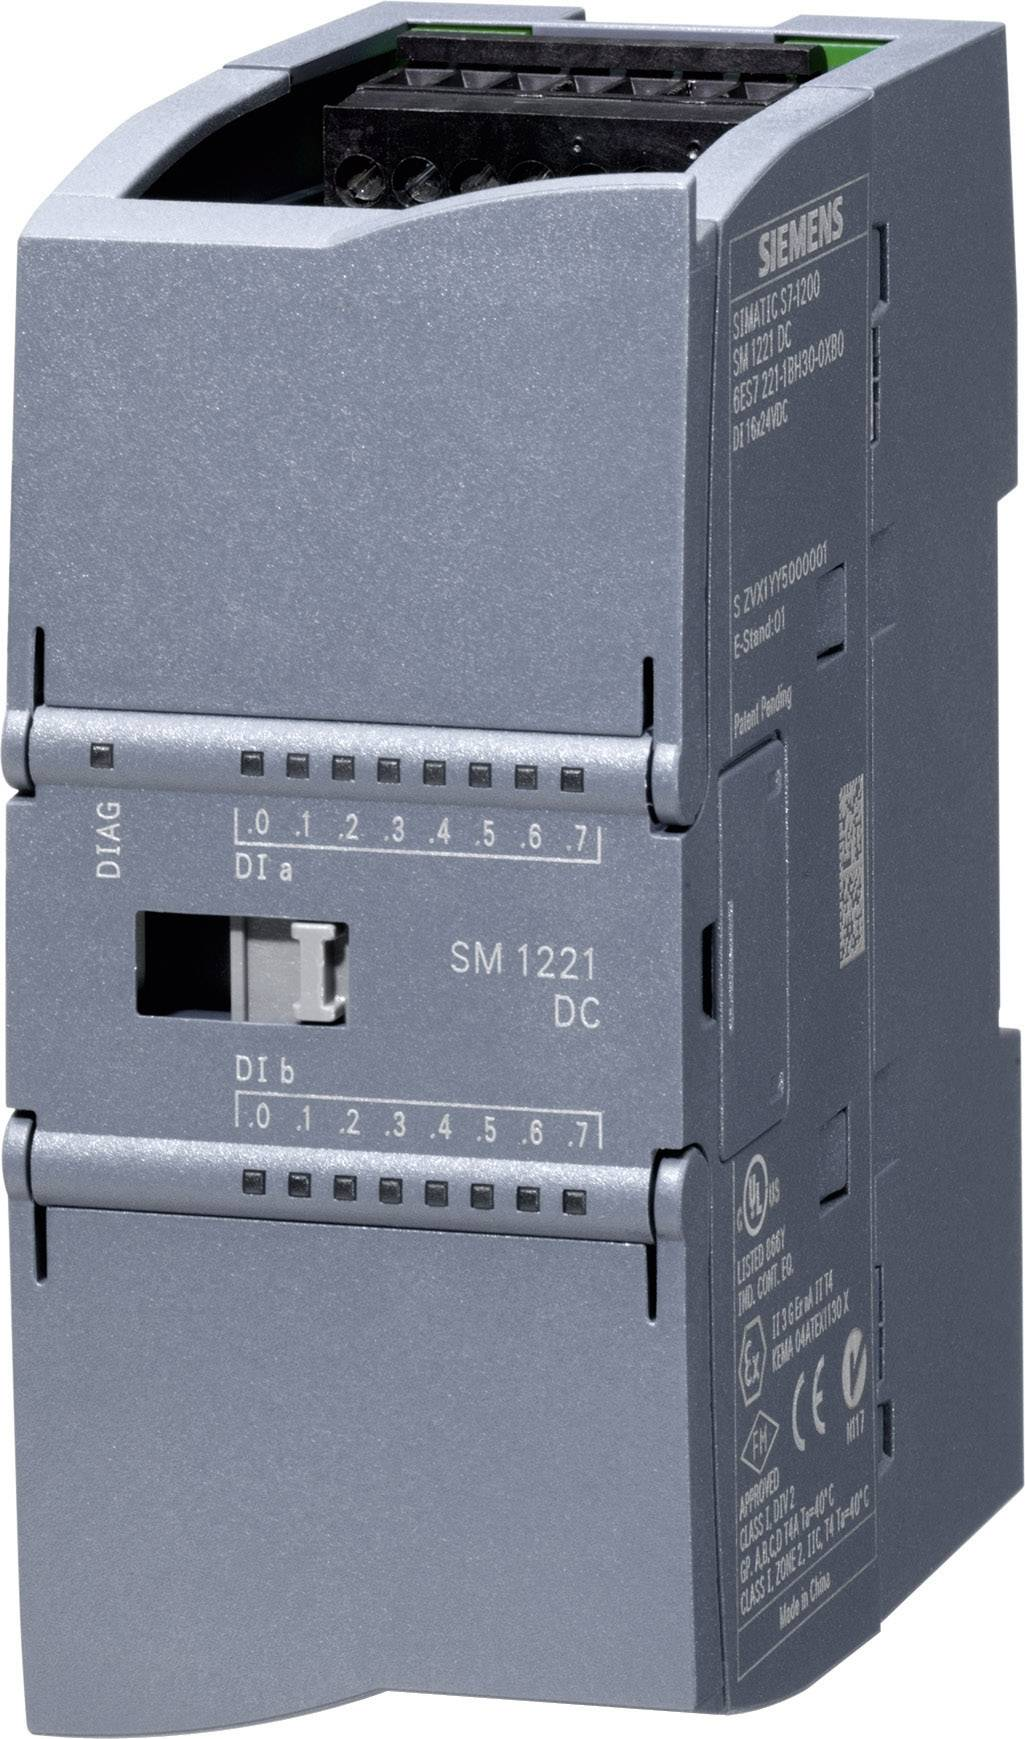 Rozšiřovací modul Siemens SM 1221 (6ES7221-1BH32-0XB0)